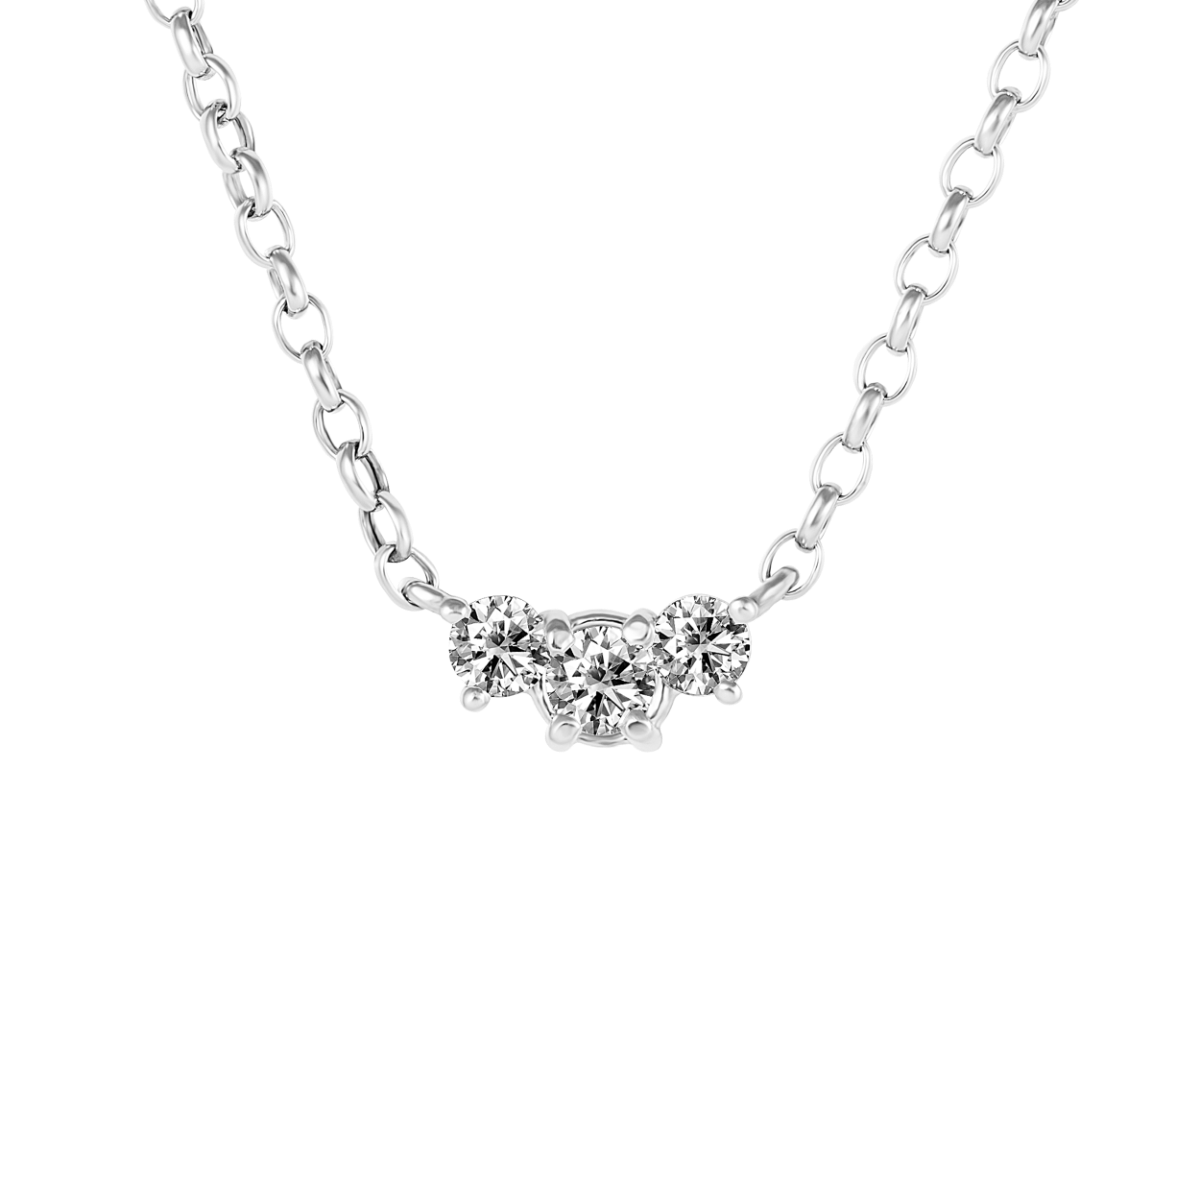 Colgante de diamantes TRILOGY